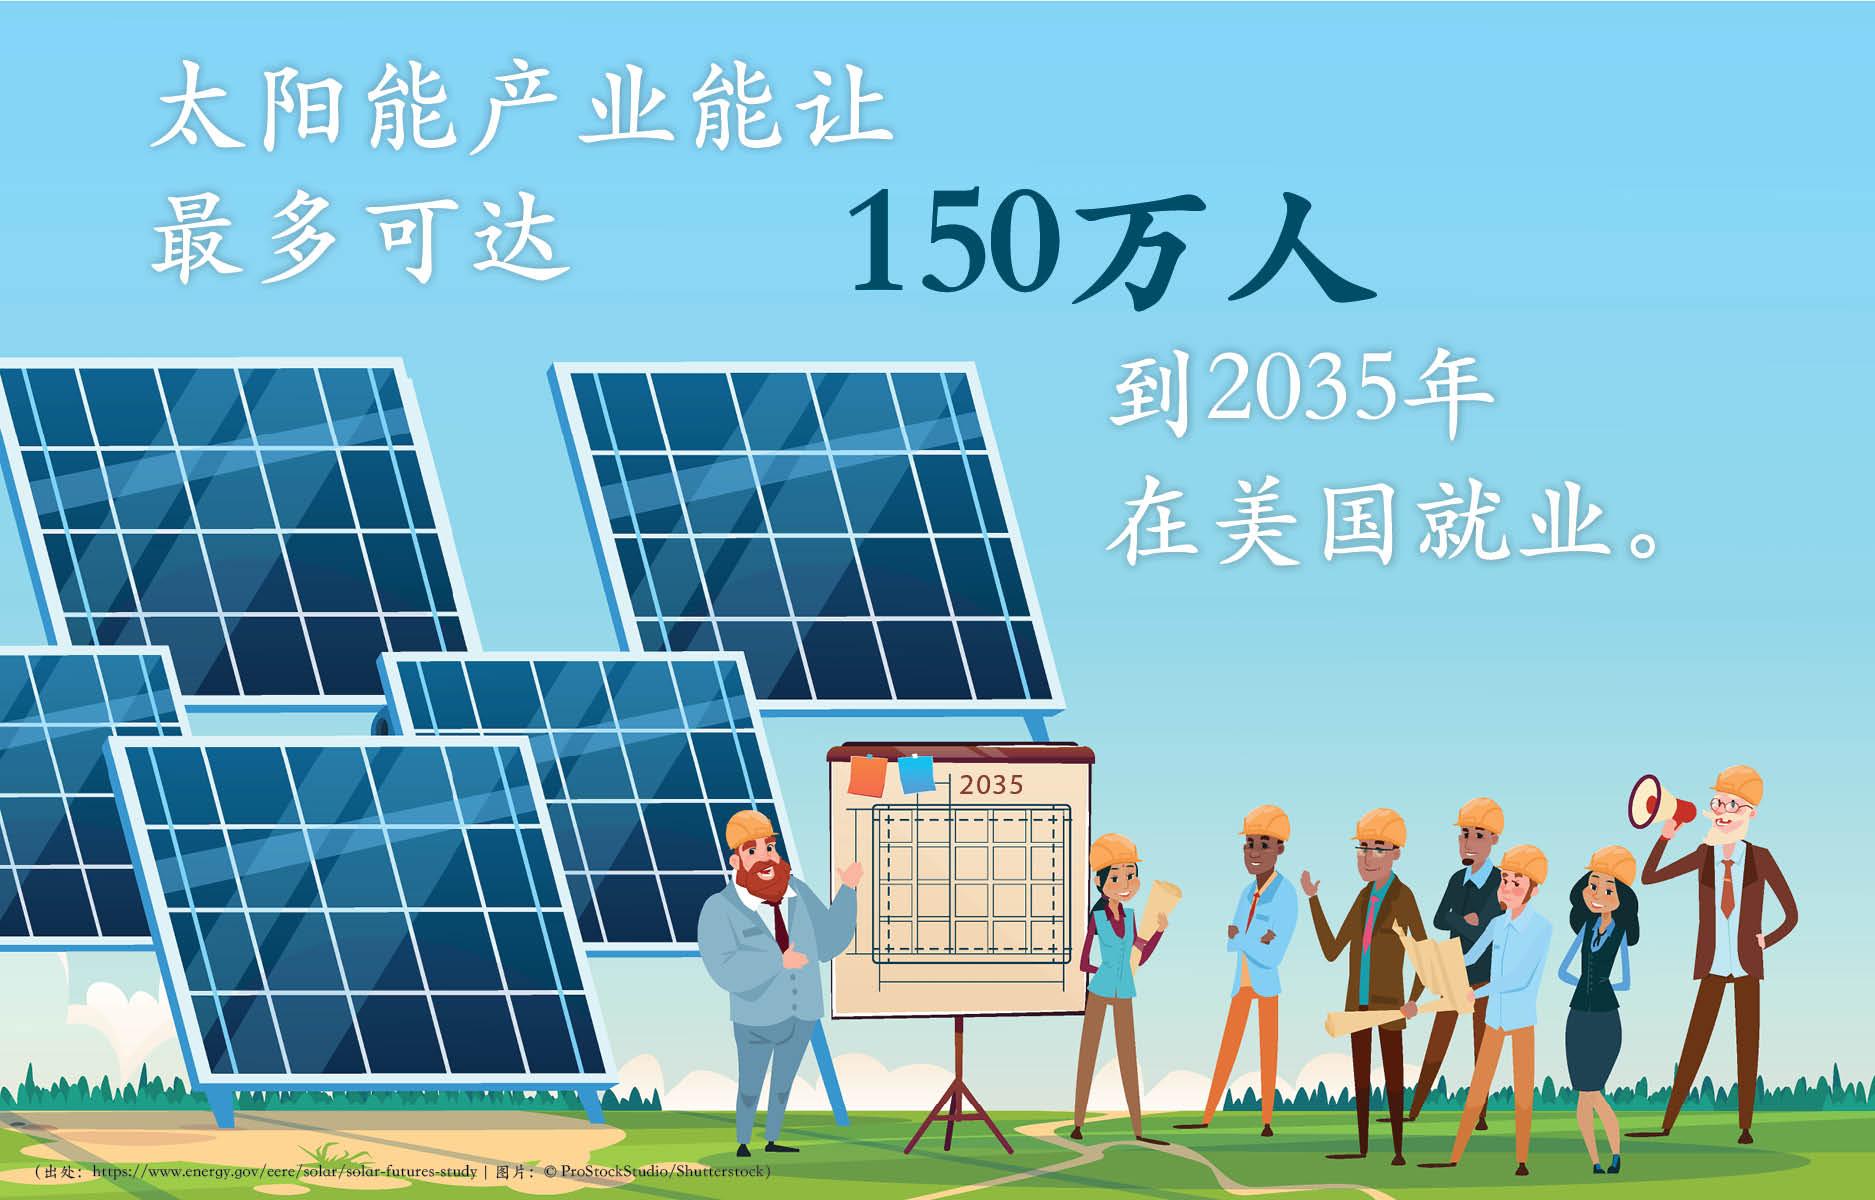 头戴安全帽的人站在太阳能板旁边以及2035年年历(出处:https://www.energy.gov/eere/solar/solar-futures-study   图片:© ProStockStudio/Shutterstock)